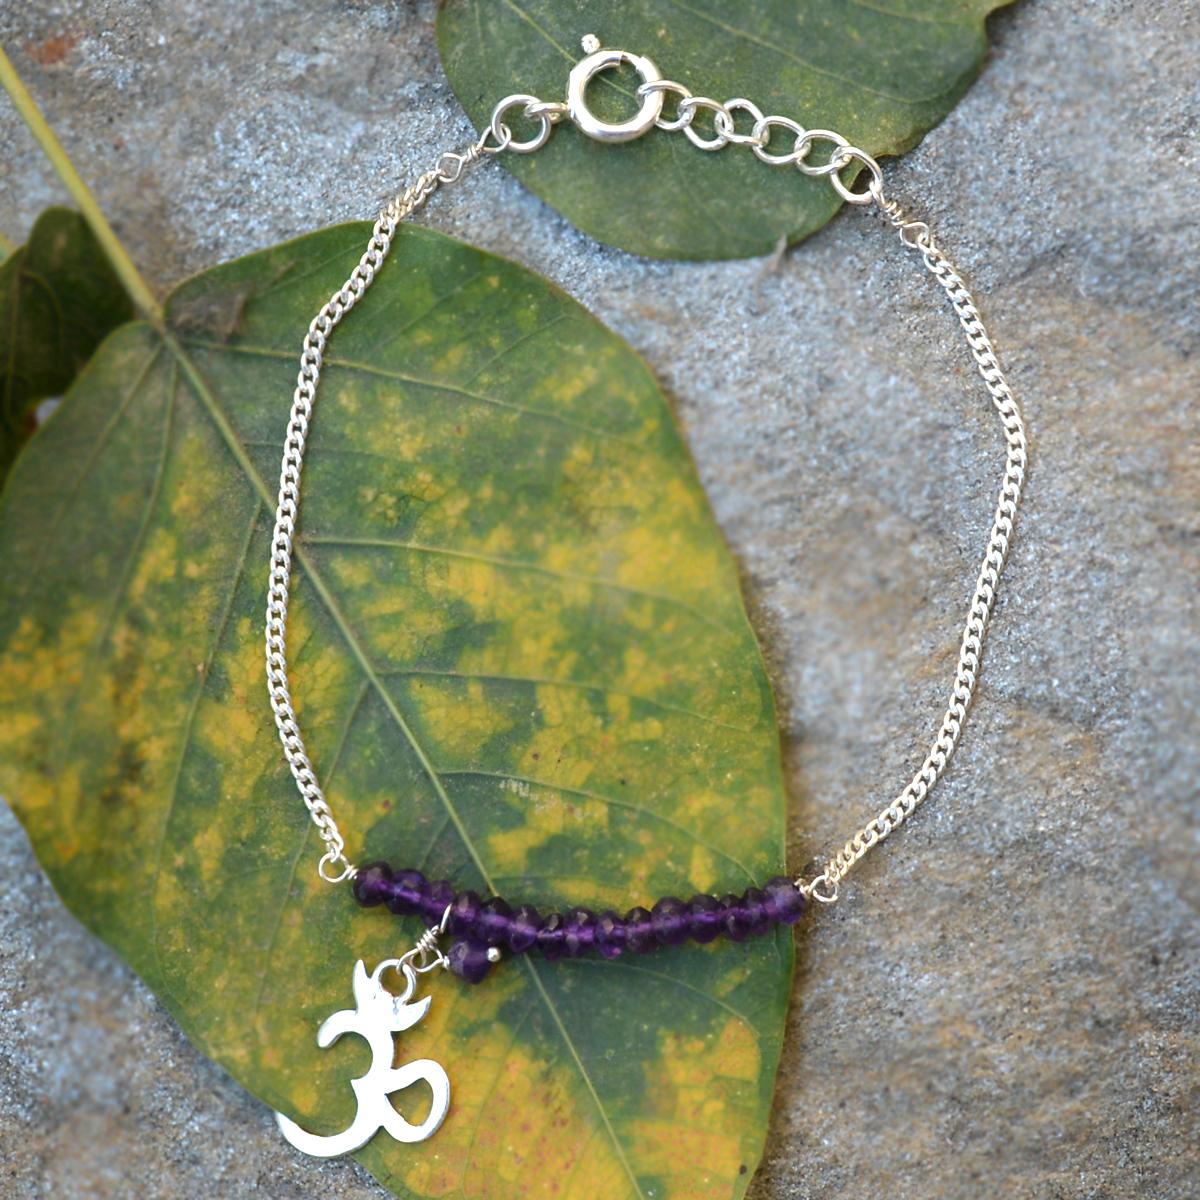 Handmade Jewelry Manufacturer 3 mm Faceted Amethyst Gemstone 925 Sterling Silver Bracelet Jaipur Rajasthan India